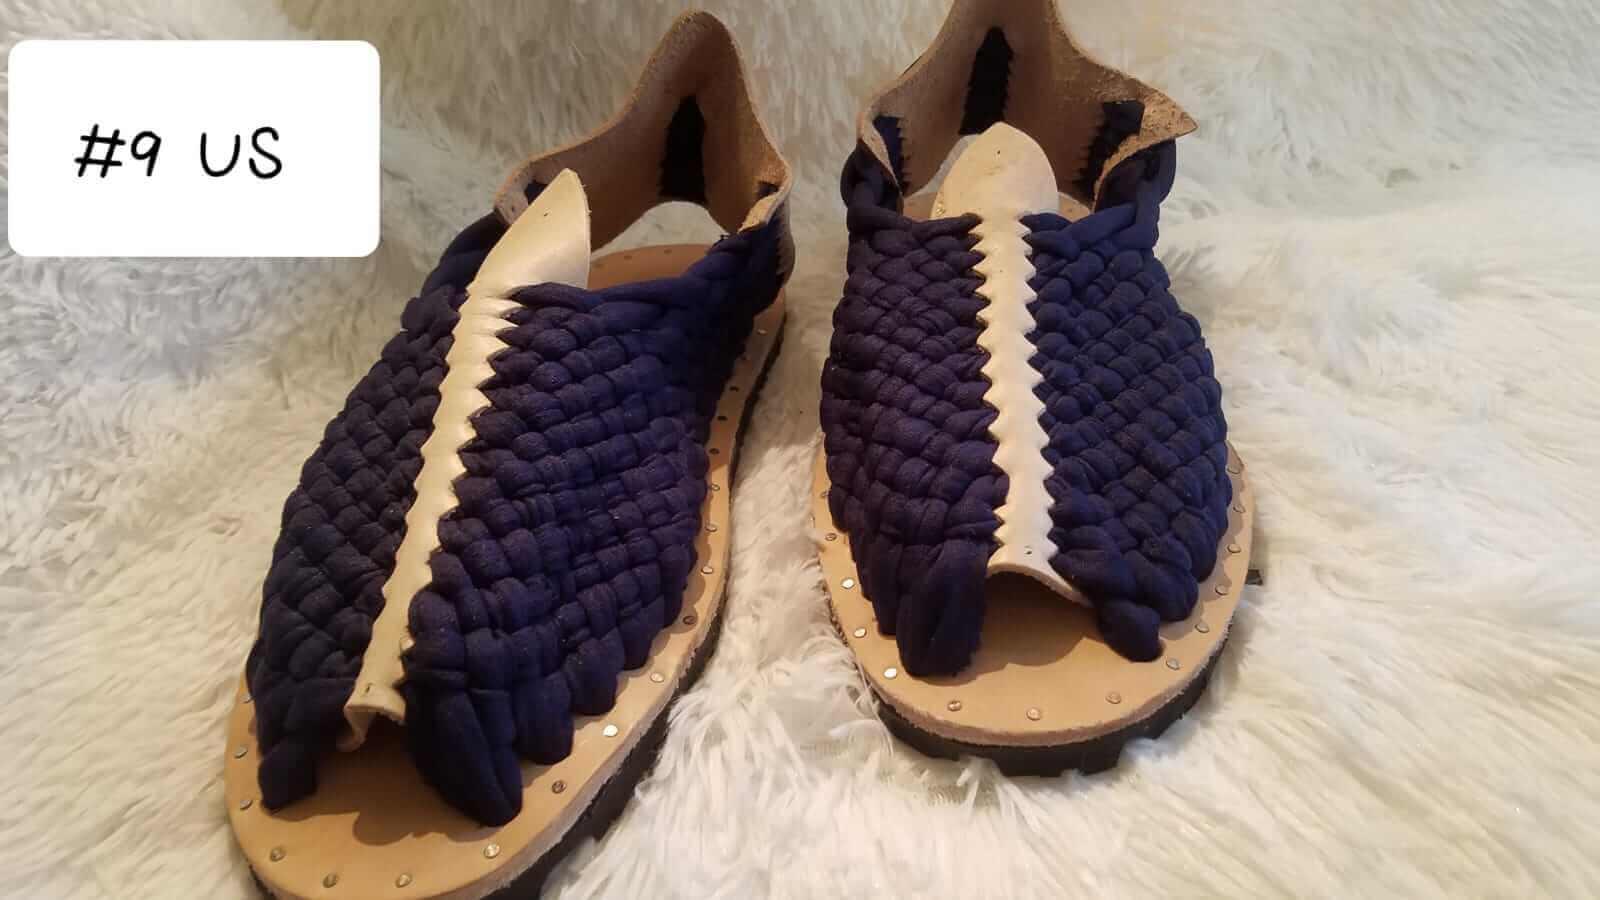 85a4d2fa186d Handmade woven Mexican sandals for men. Huaraches